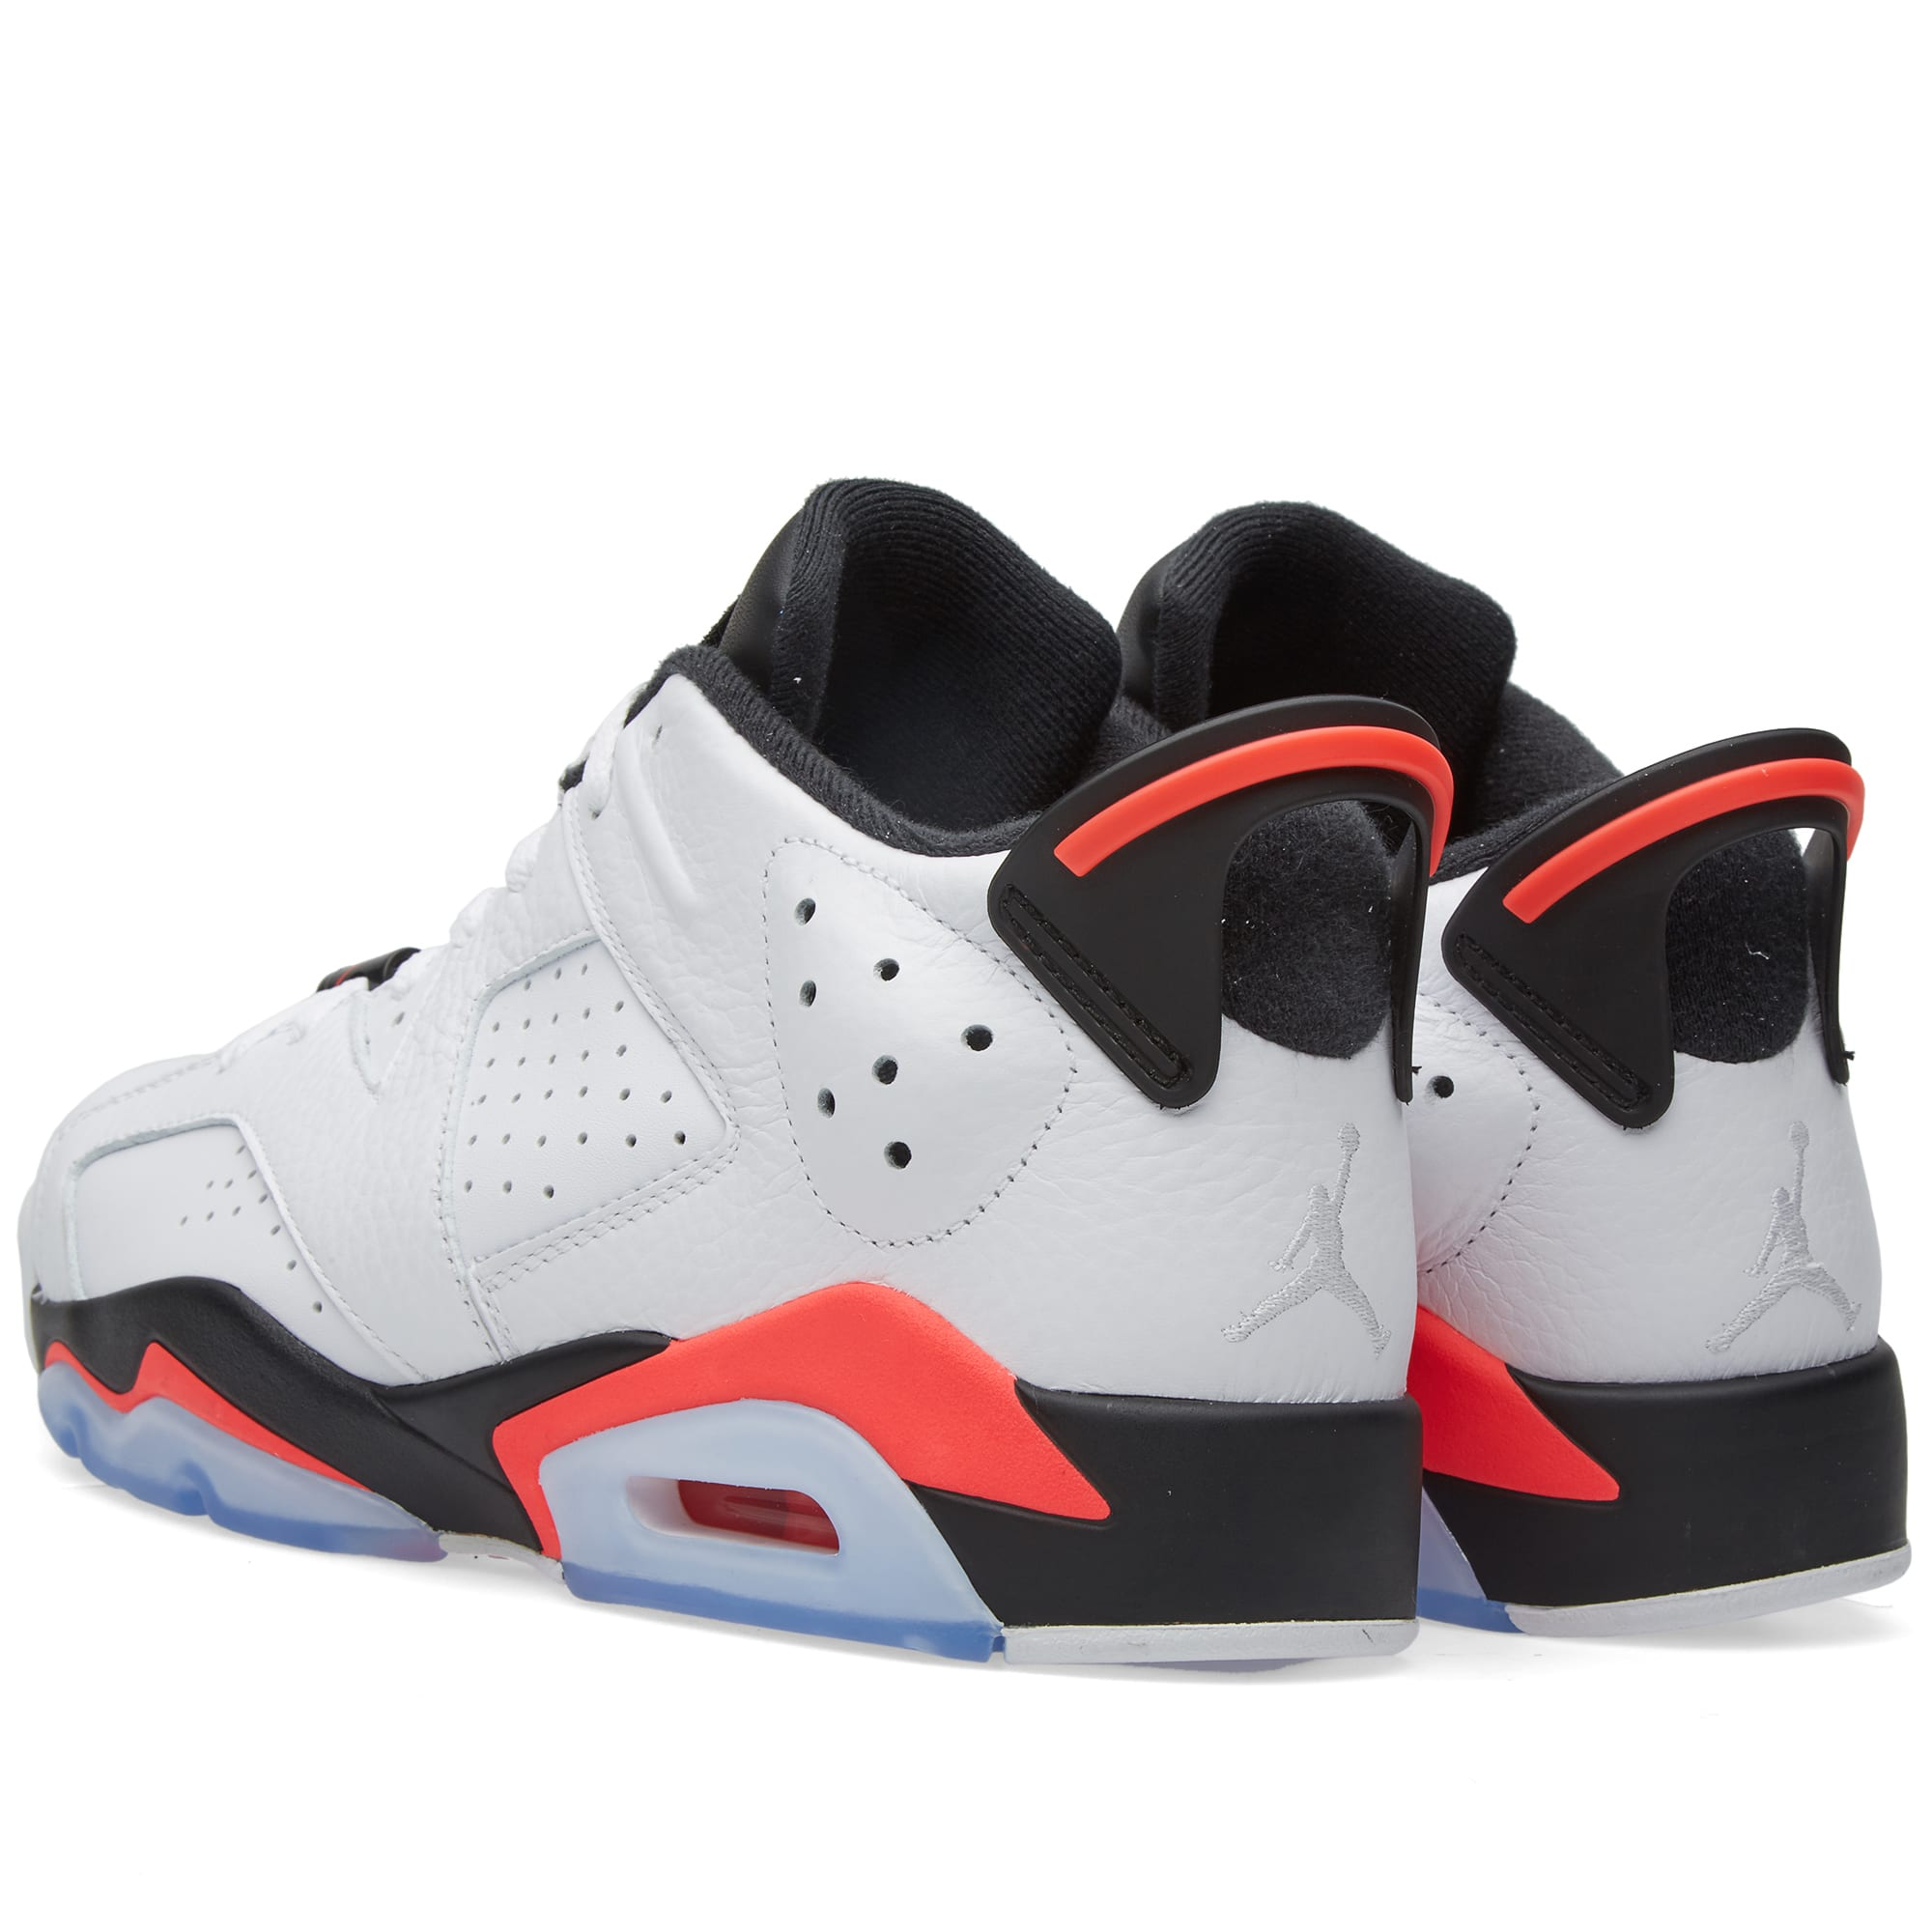 classic fit 59707 f5aa4 Nike Air Jordan 6 Retro Low White, Infrared 23   Black   END.